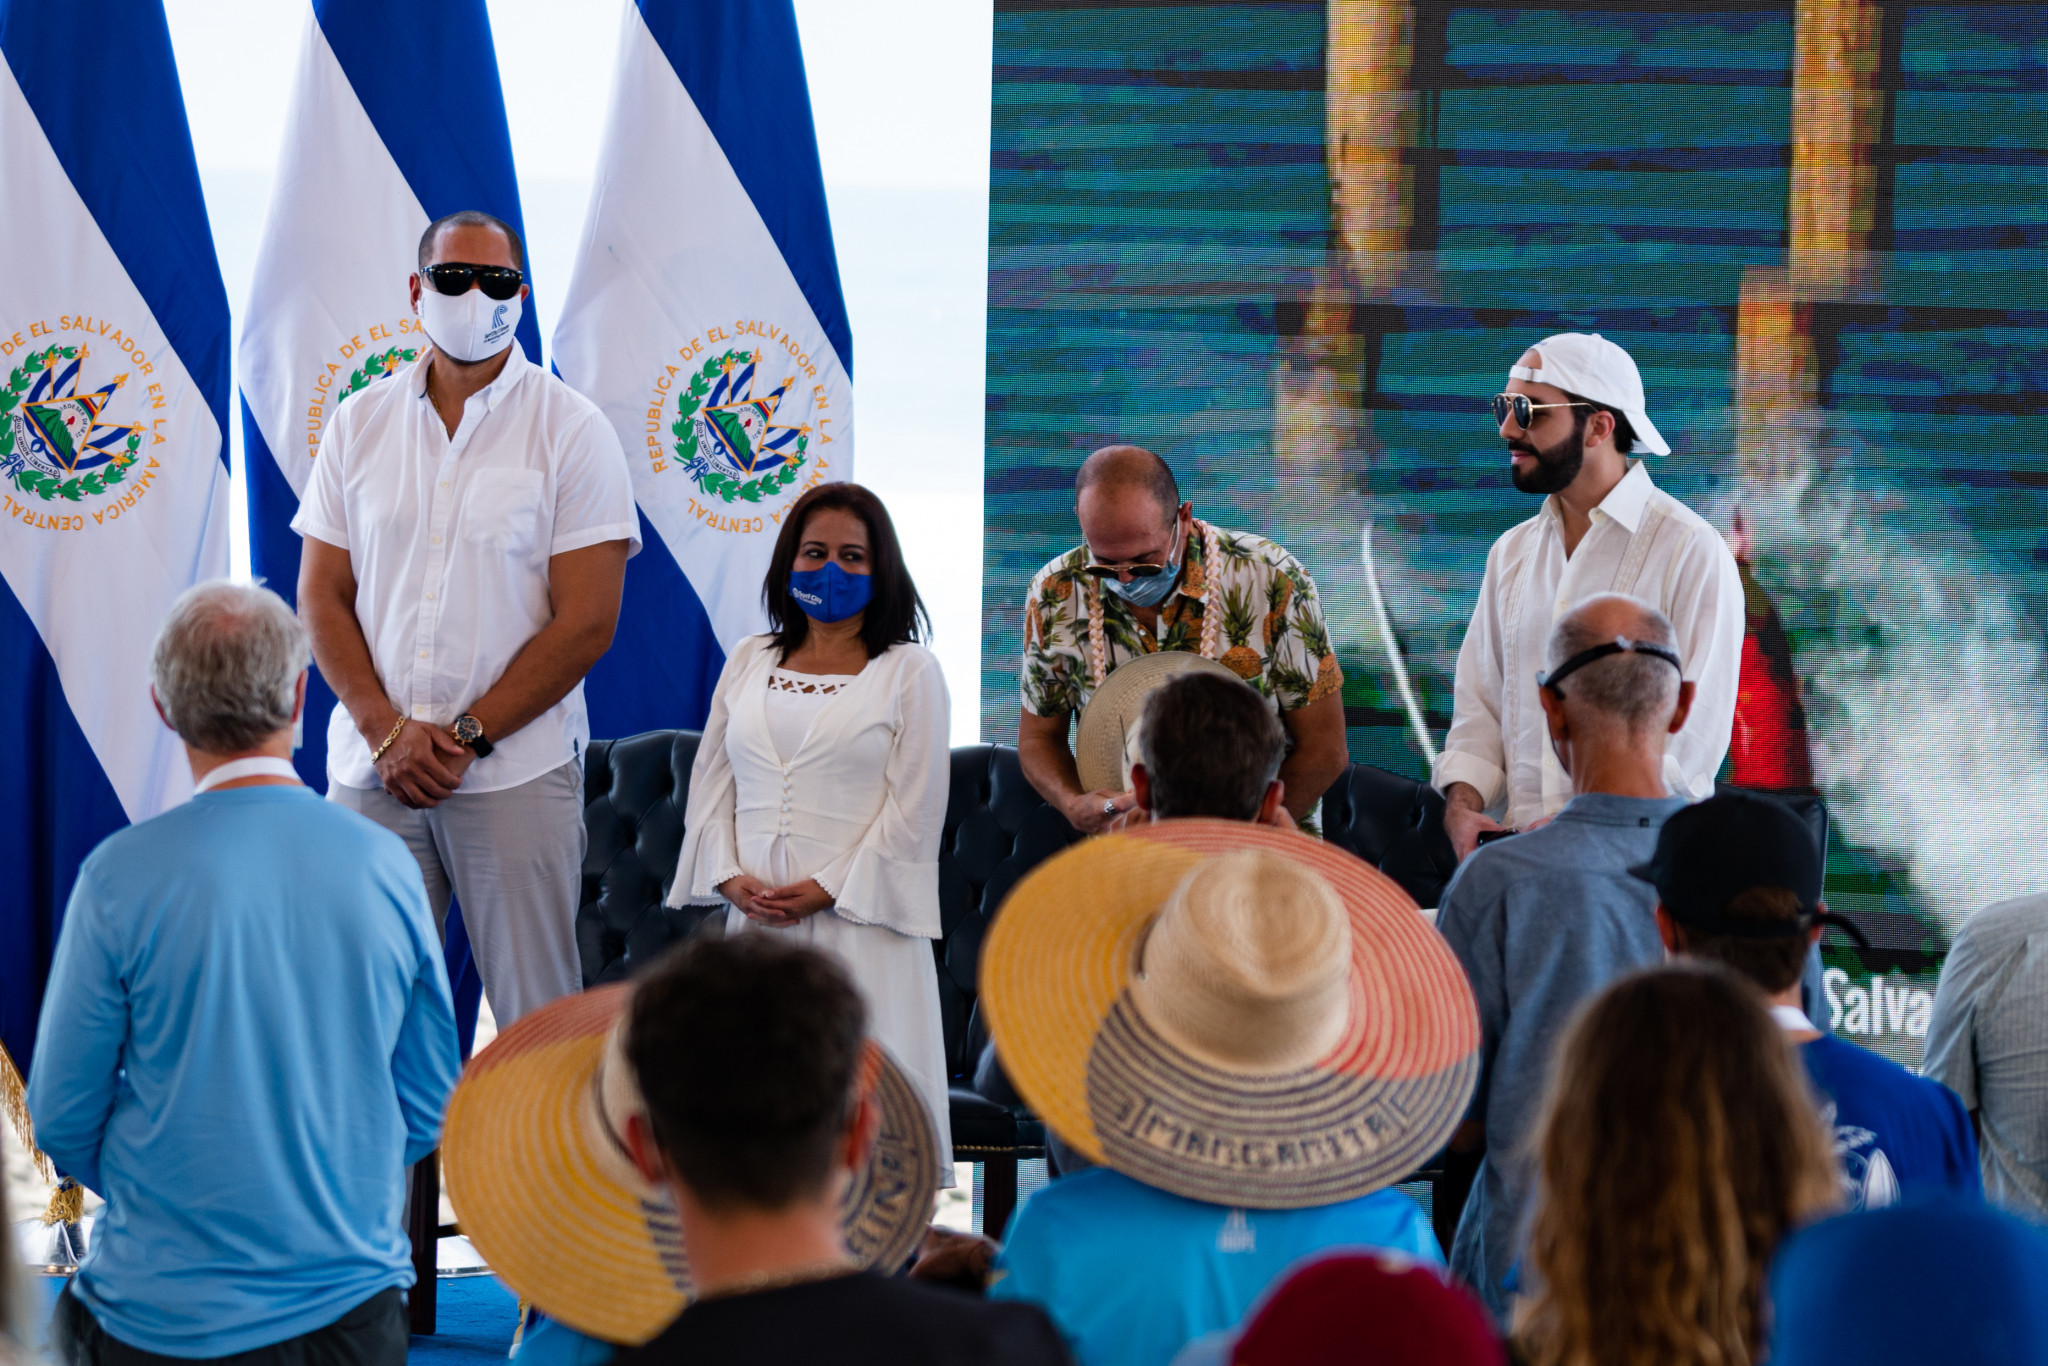 World Surfing Games set to begin in El Salvador